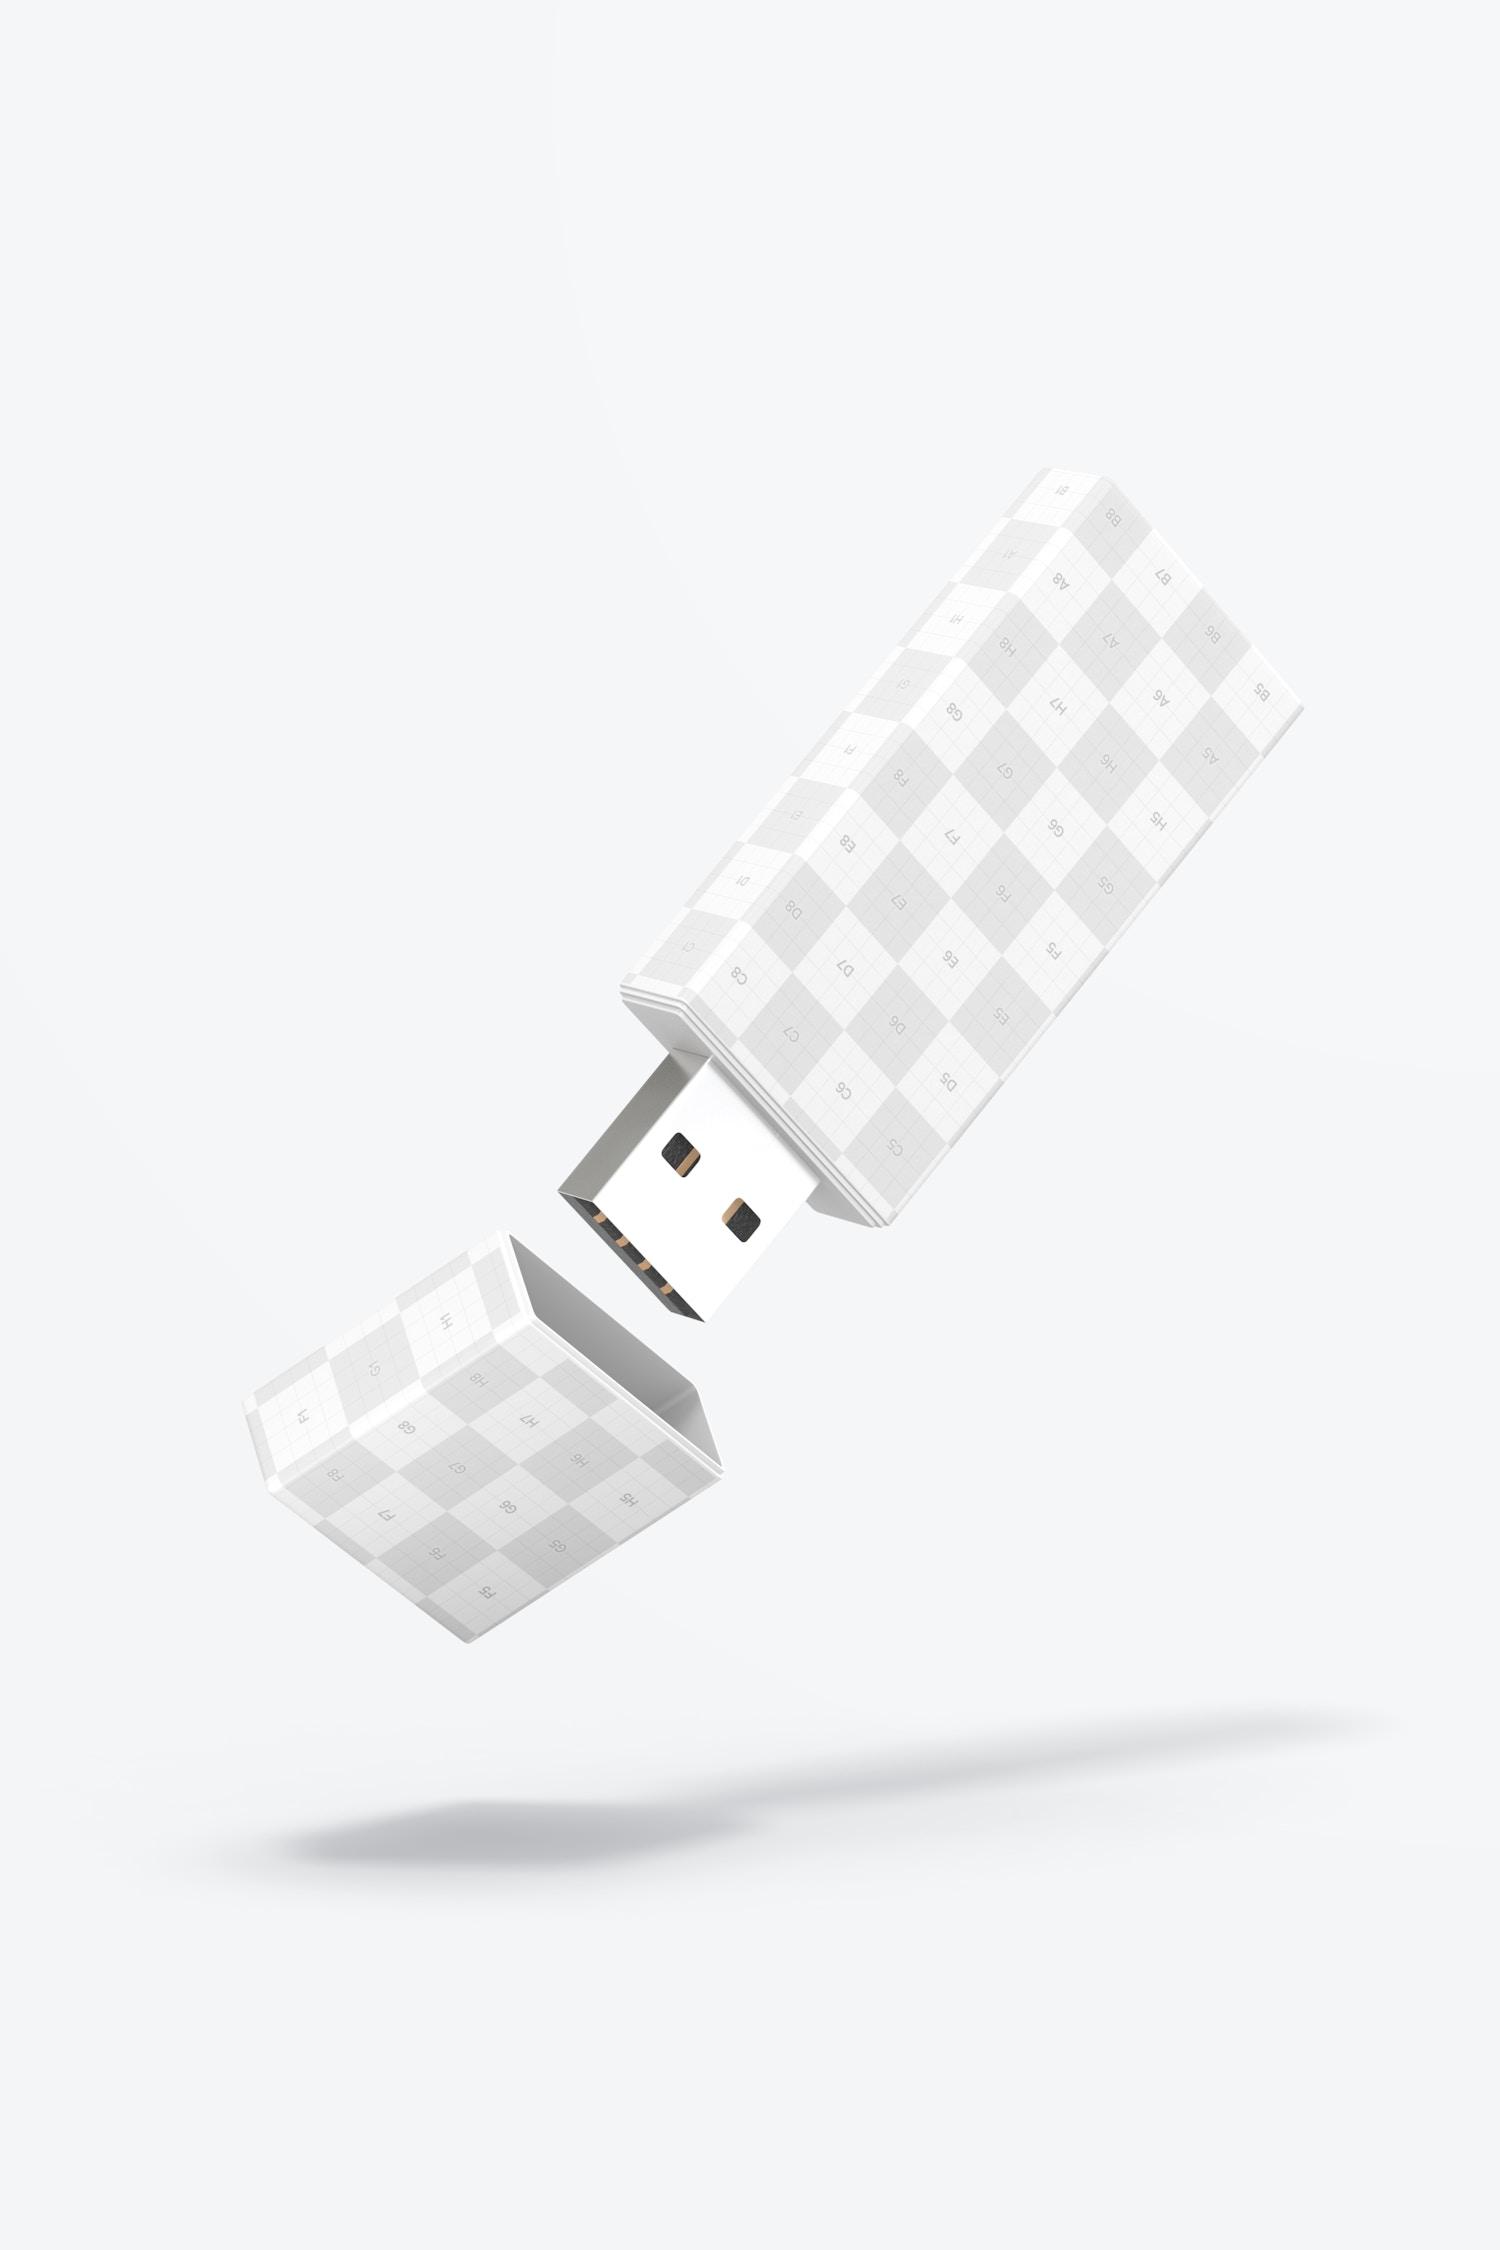 Plastic USB Flash Drive Mockup, Falling